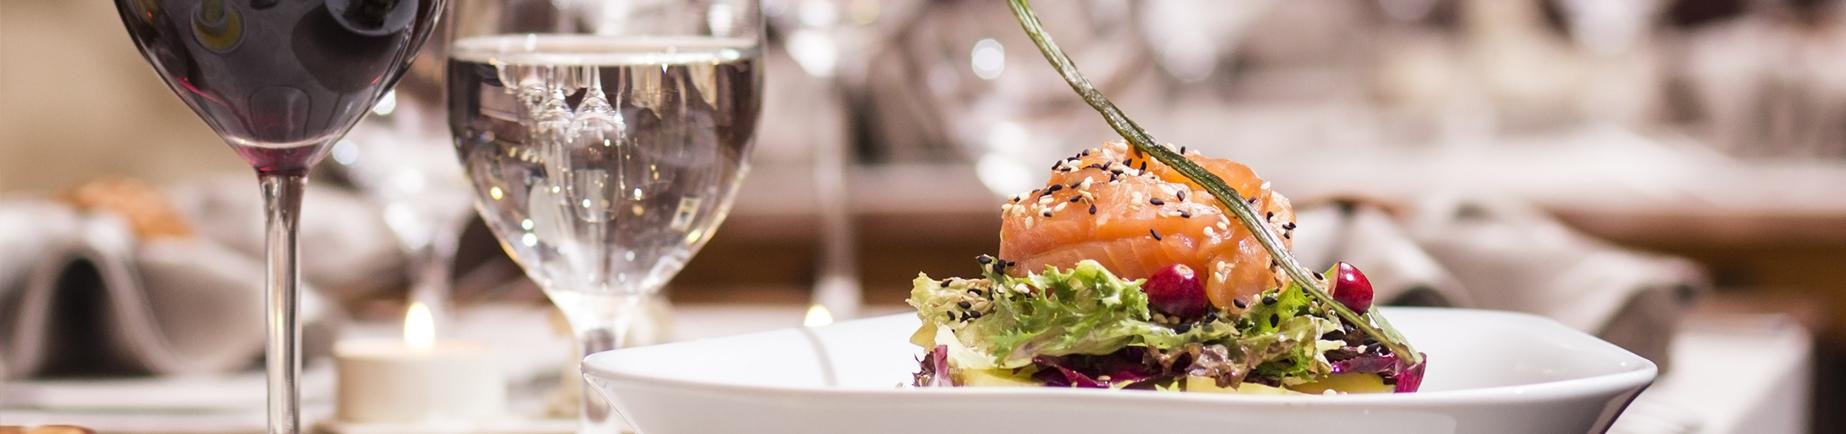 Hospitality & Restaurant